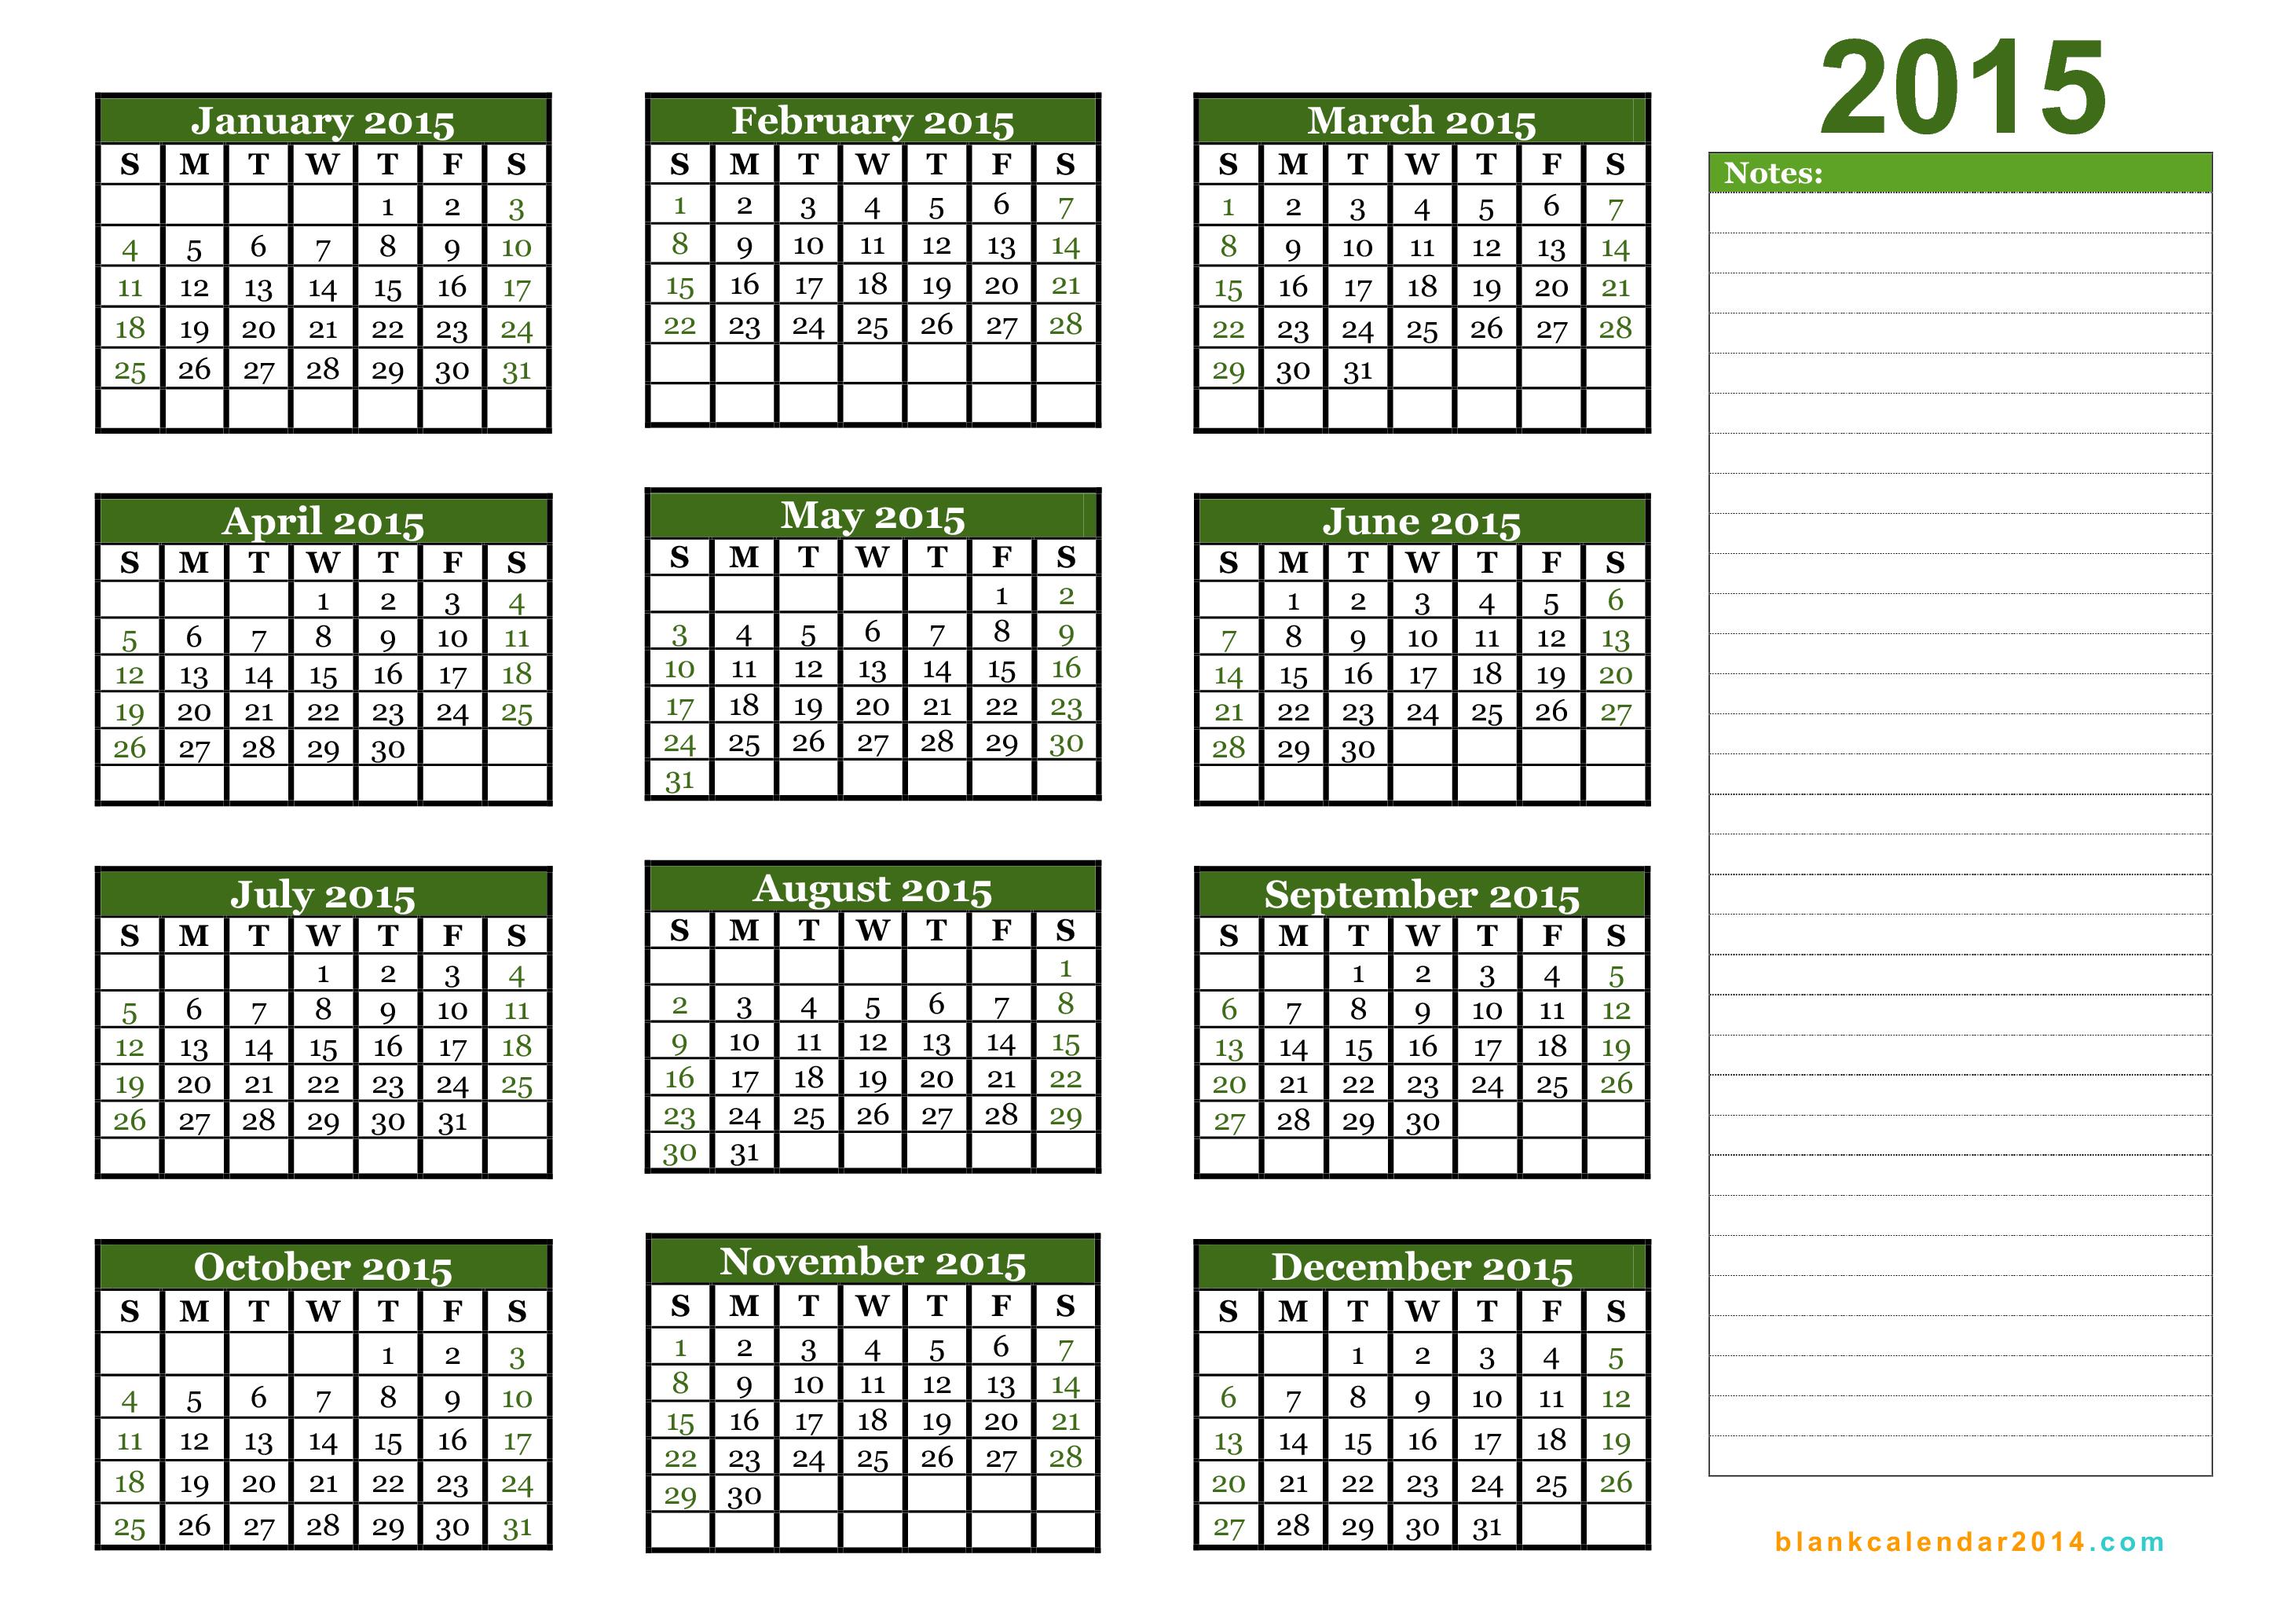 Julian Calendar 2015 | Printable 2017 Calendars with regard to 2014 12 Month Blank Calendar